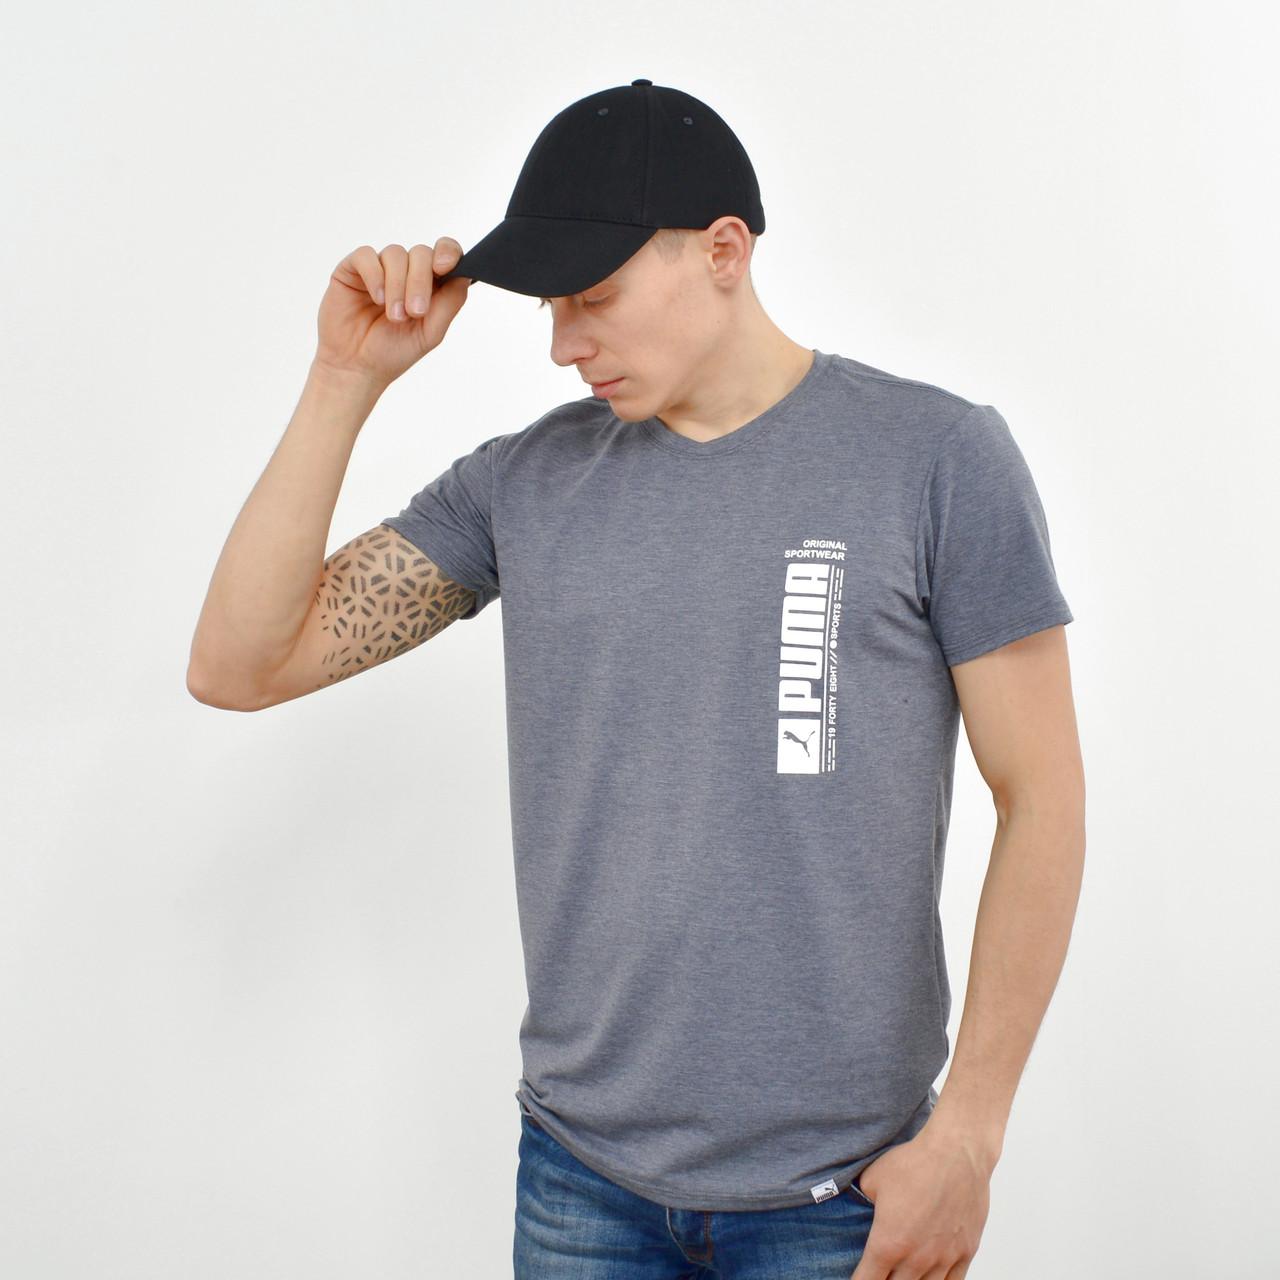 Мужская футболка с накаткой Puma (реплика) серый